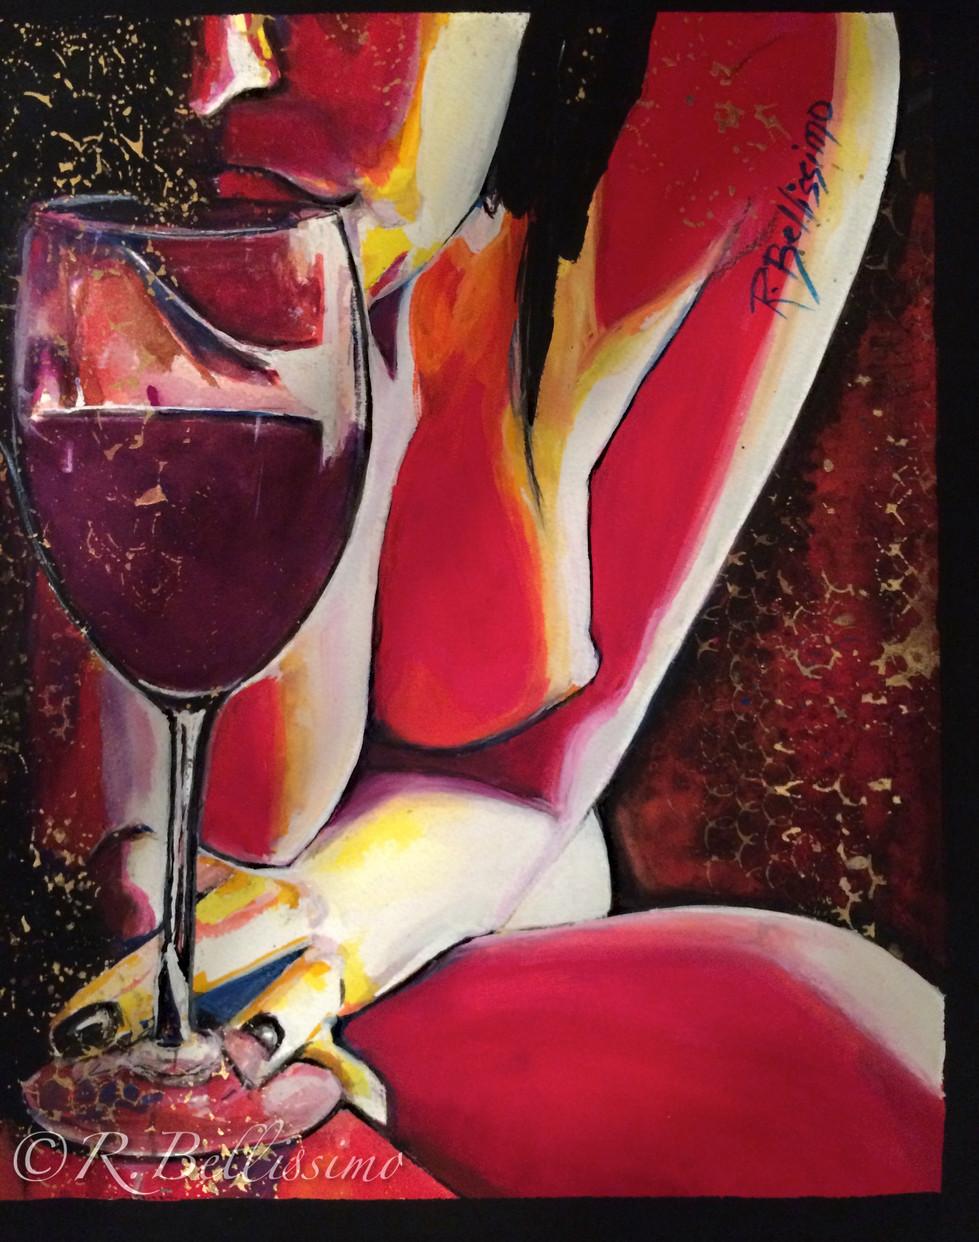 Liz and the Wine Glass